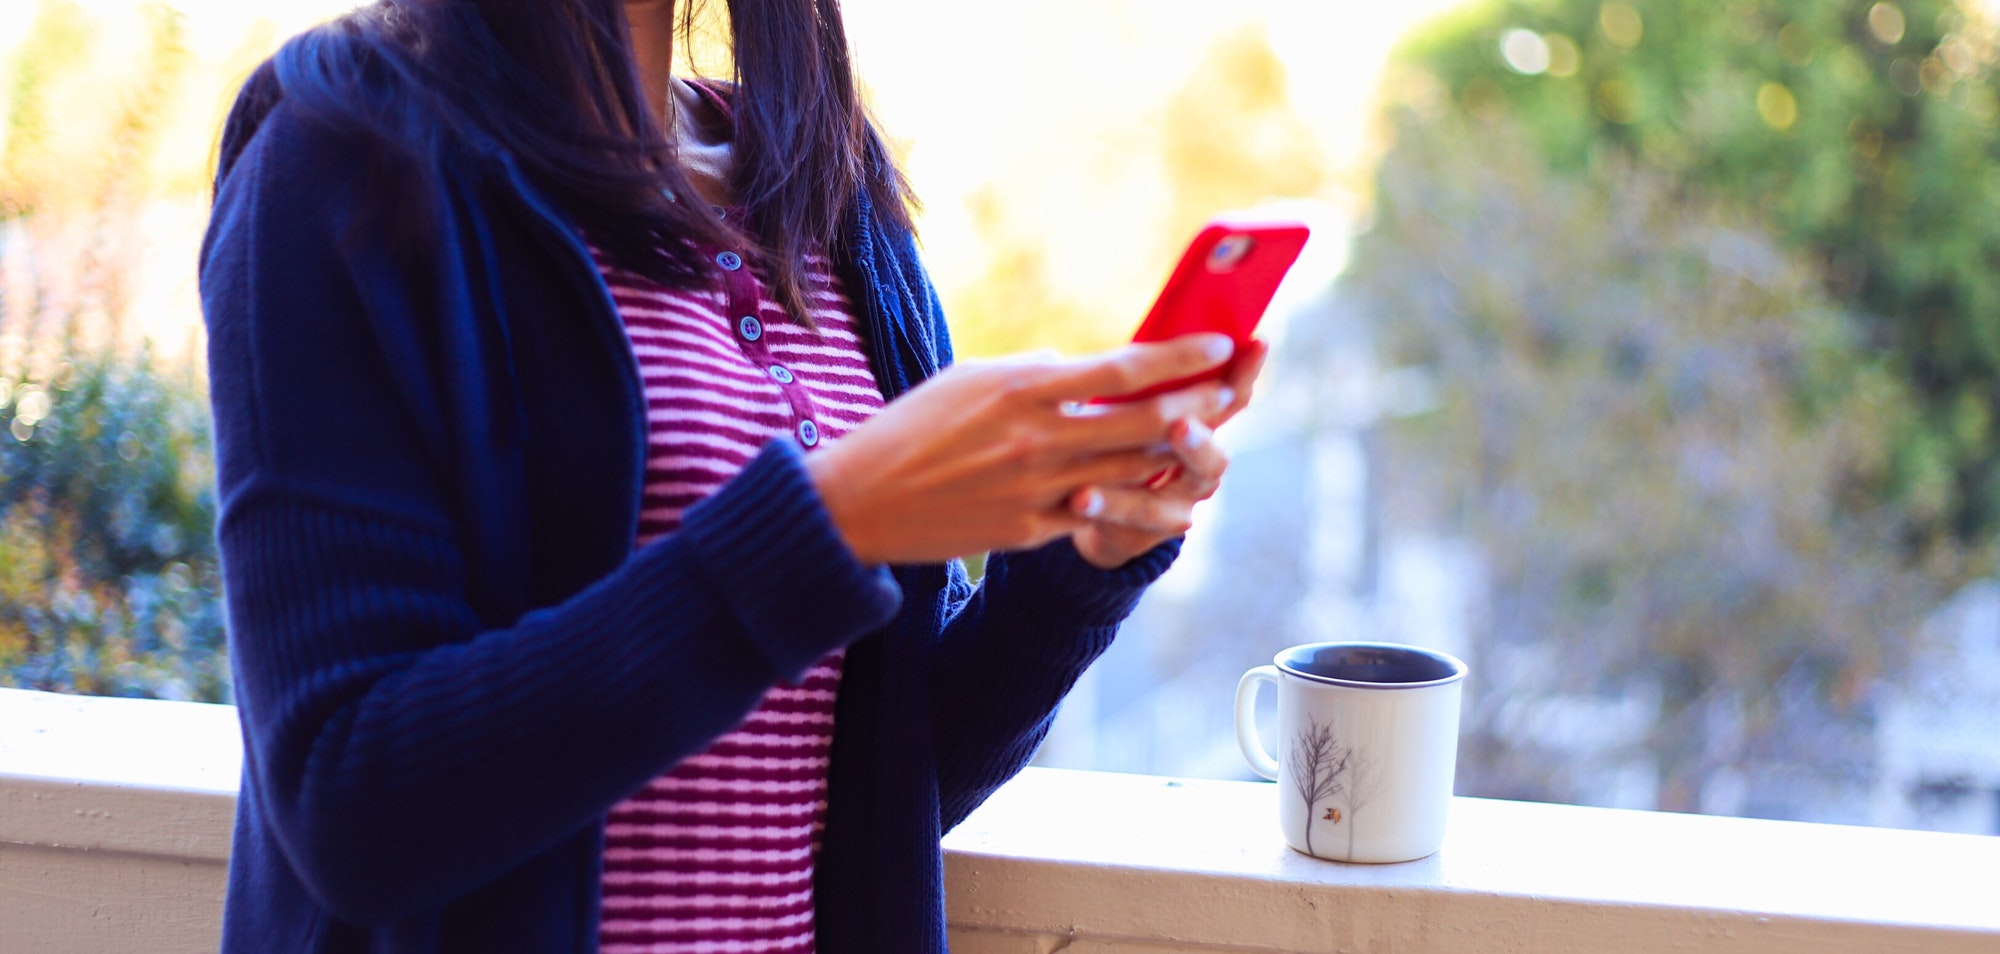 Kako ustvarim Facebook profil za svojo stran?Texting friends on a Sunday afternoon